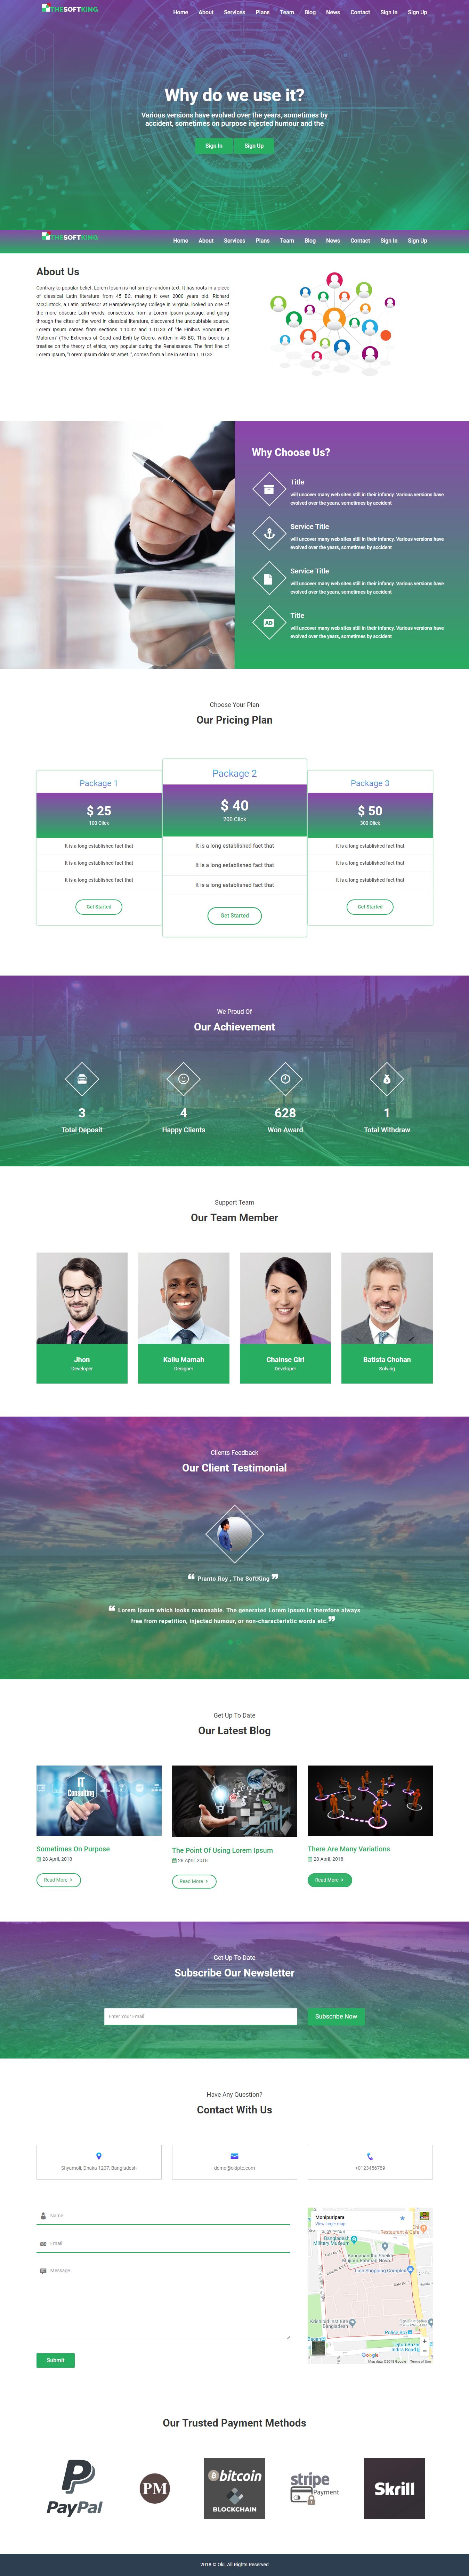 Oki - Pay Per Click Platform